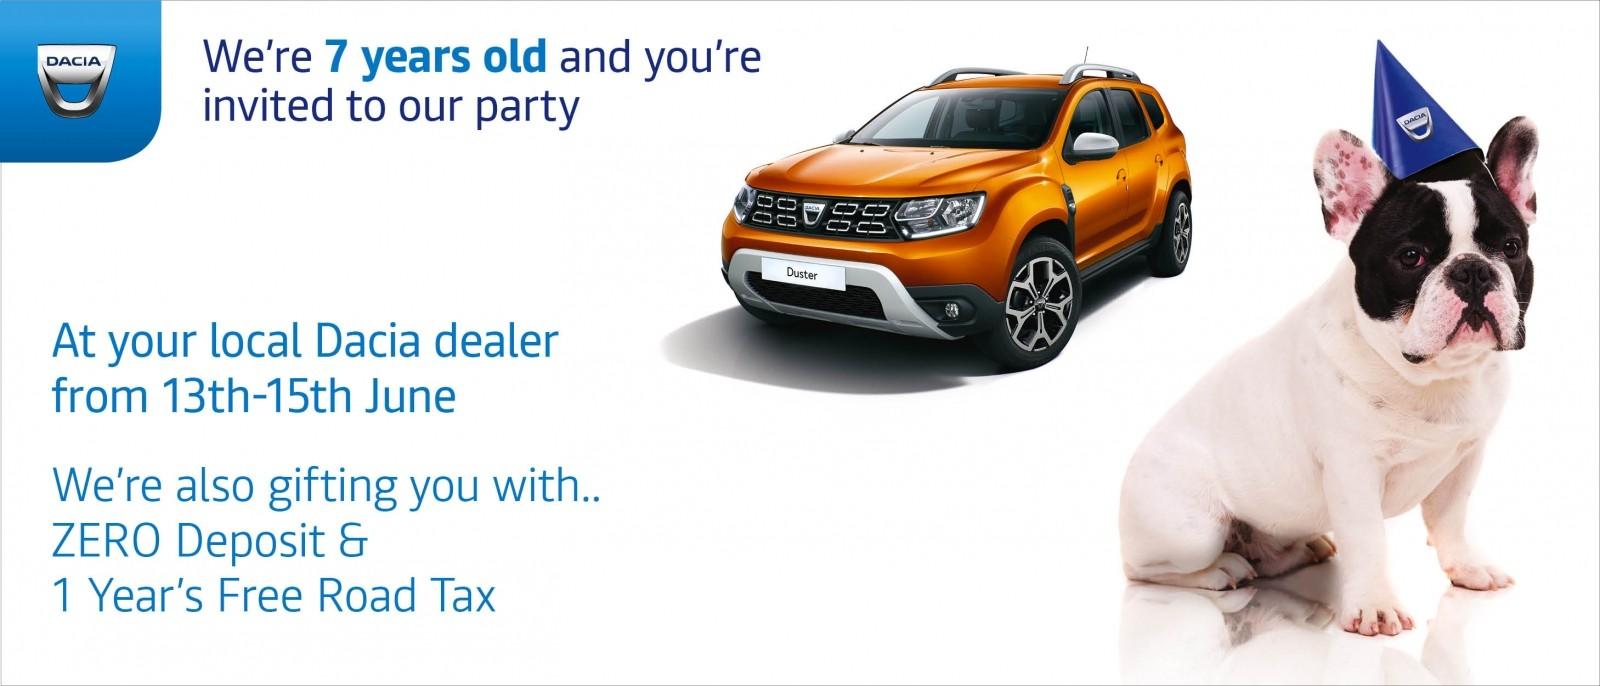 39334_Dacia-7th_Birthday_AUTOIMAGE_Web-Banner-2917x1250px_Version-1_Duster